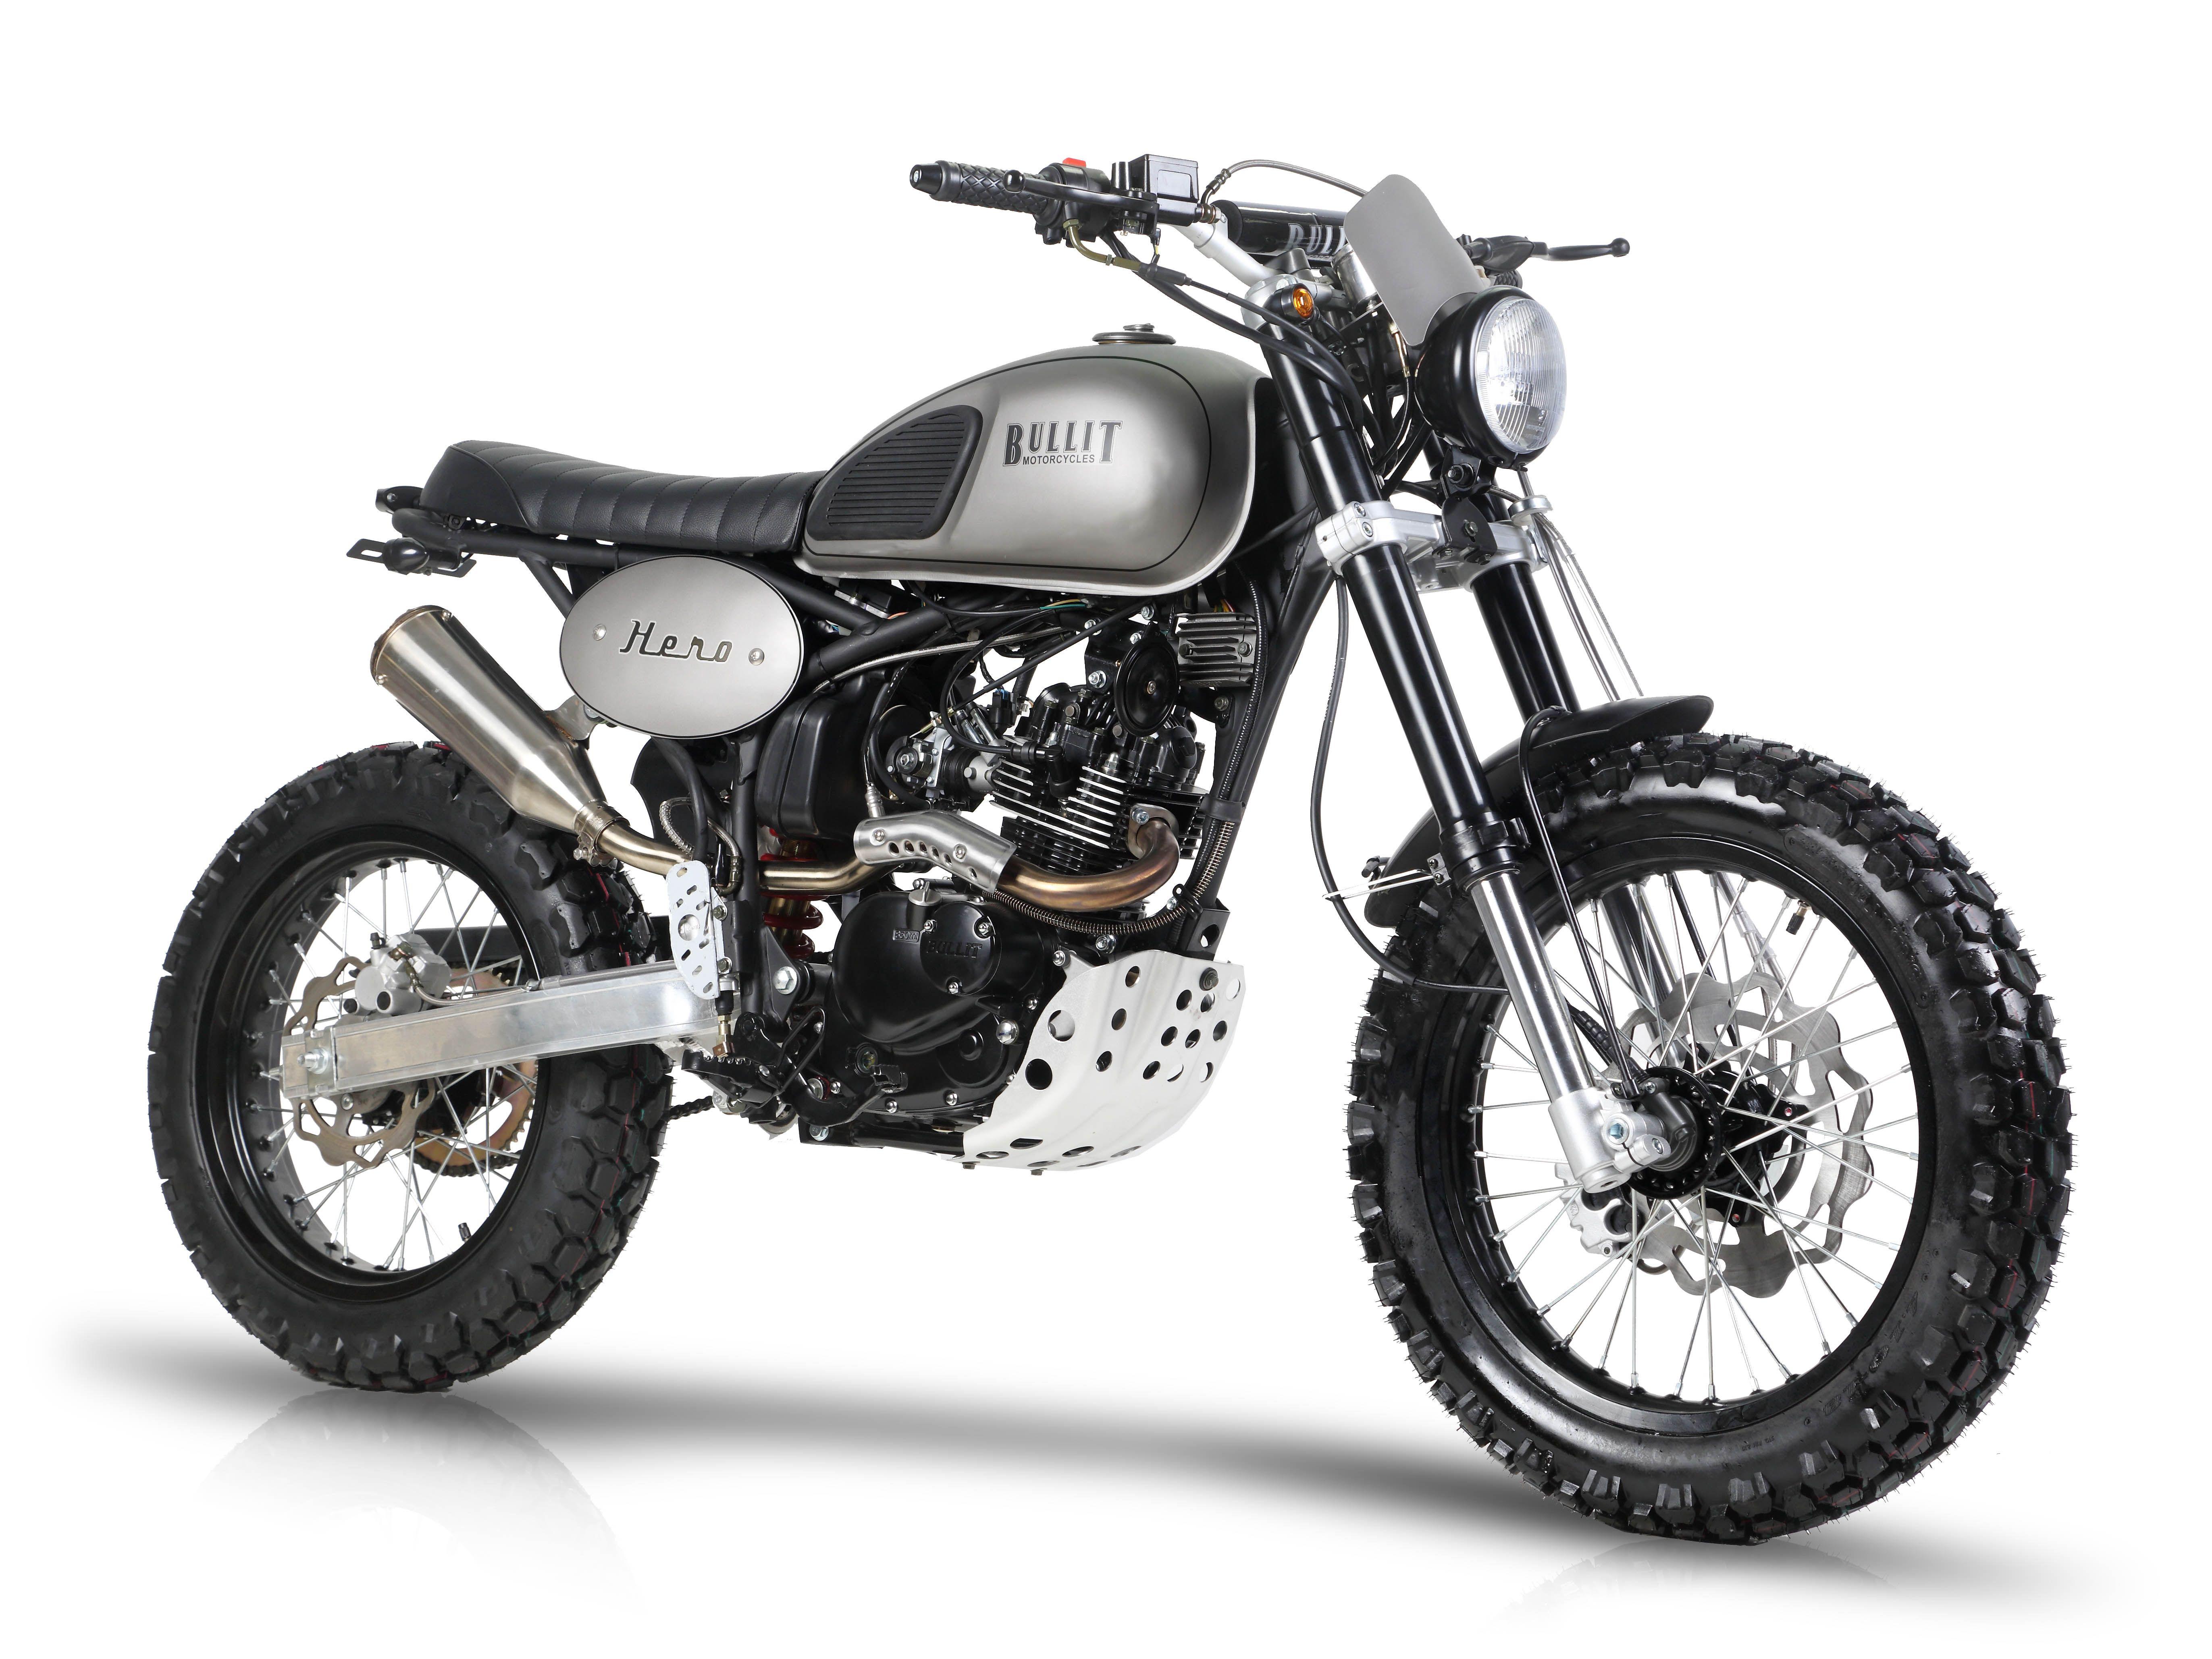 bullit motorcycles hero 125 tracker scrambler cafra. Black Bedroom Furniture Sets. Home Design Ideas